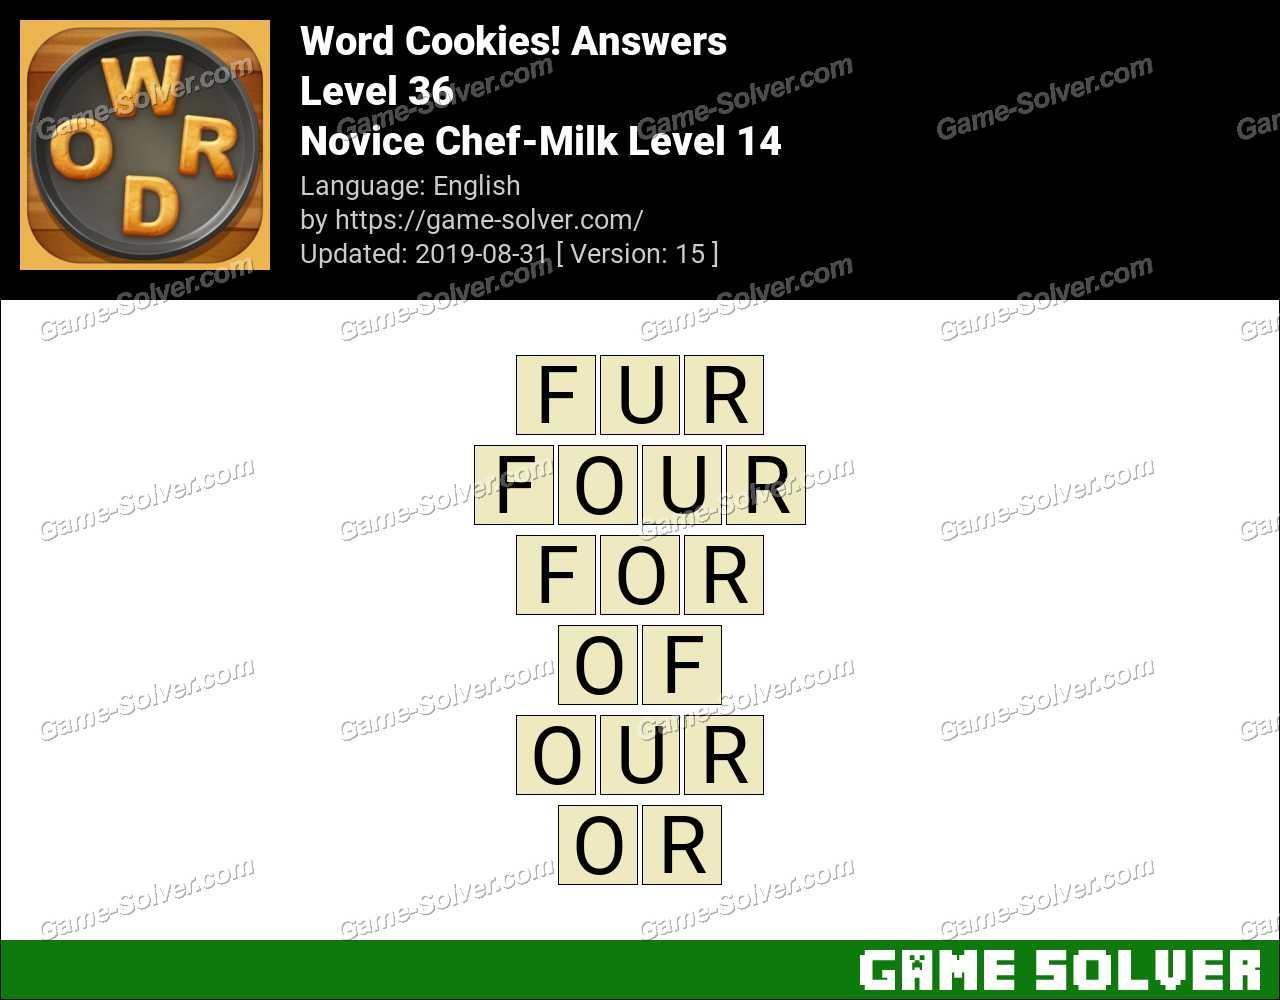 Word Cookies Novice Chef-Milk Level 14 Answers